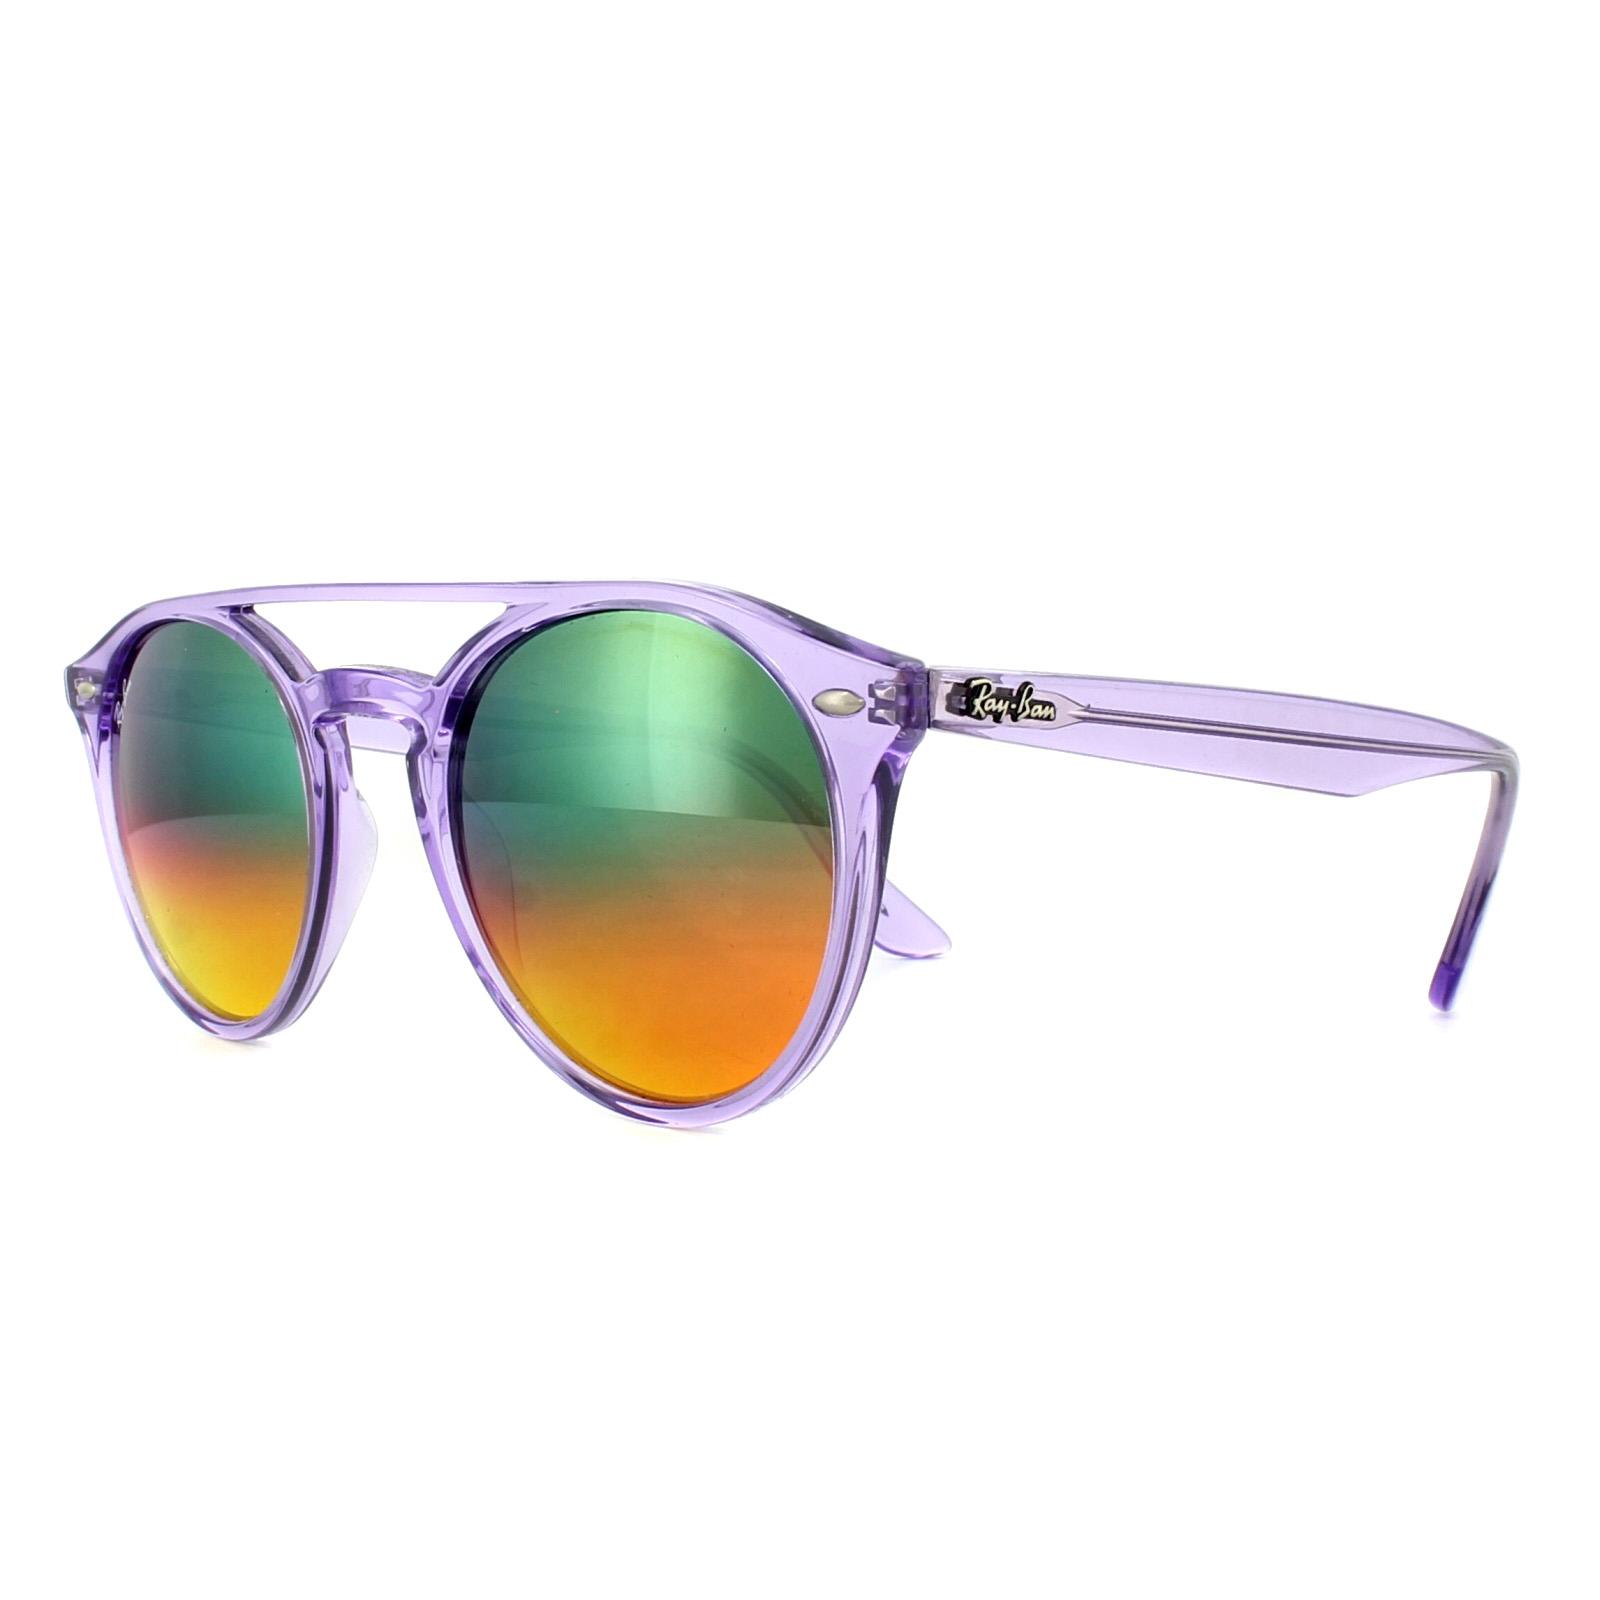 5589635cacb Sentinel Ray-Ban Sunglasses 4279 6280A8 Violet Orange Gradient Mirror